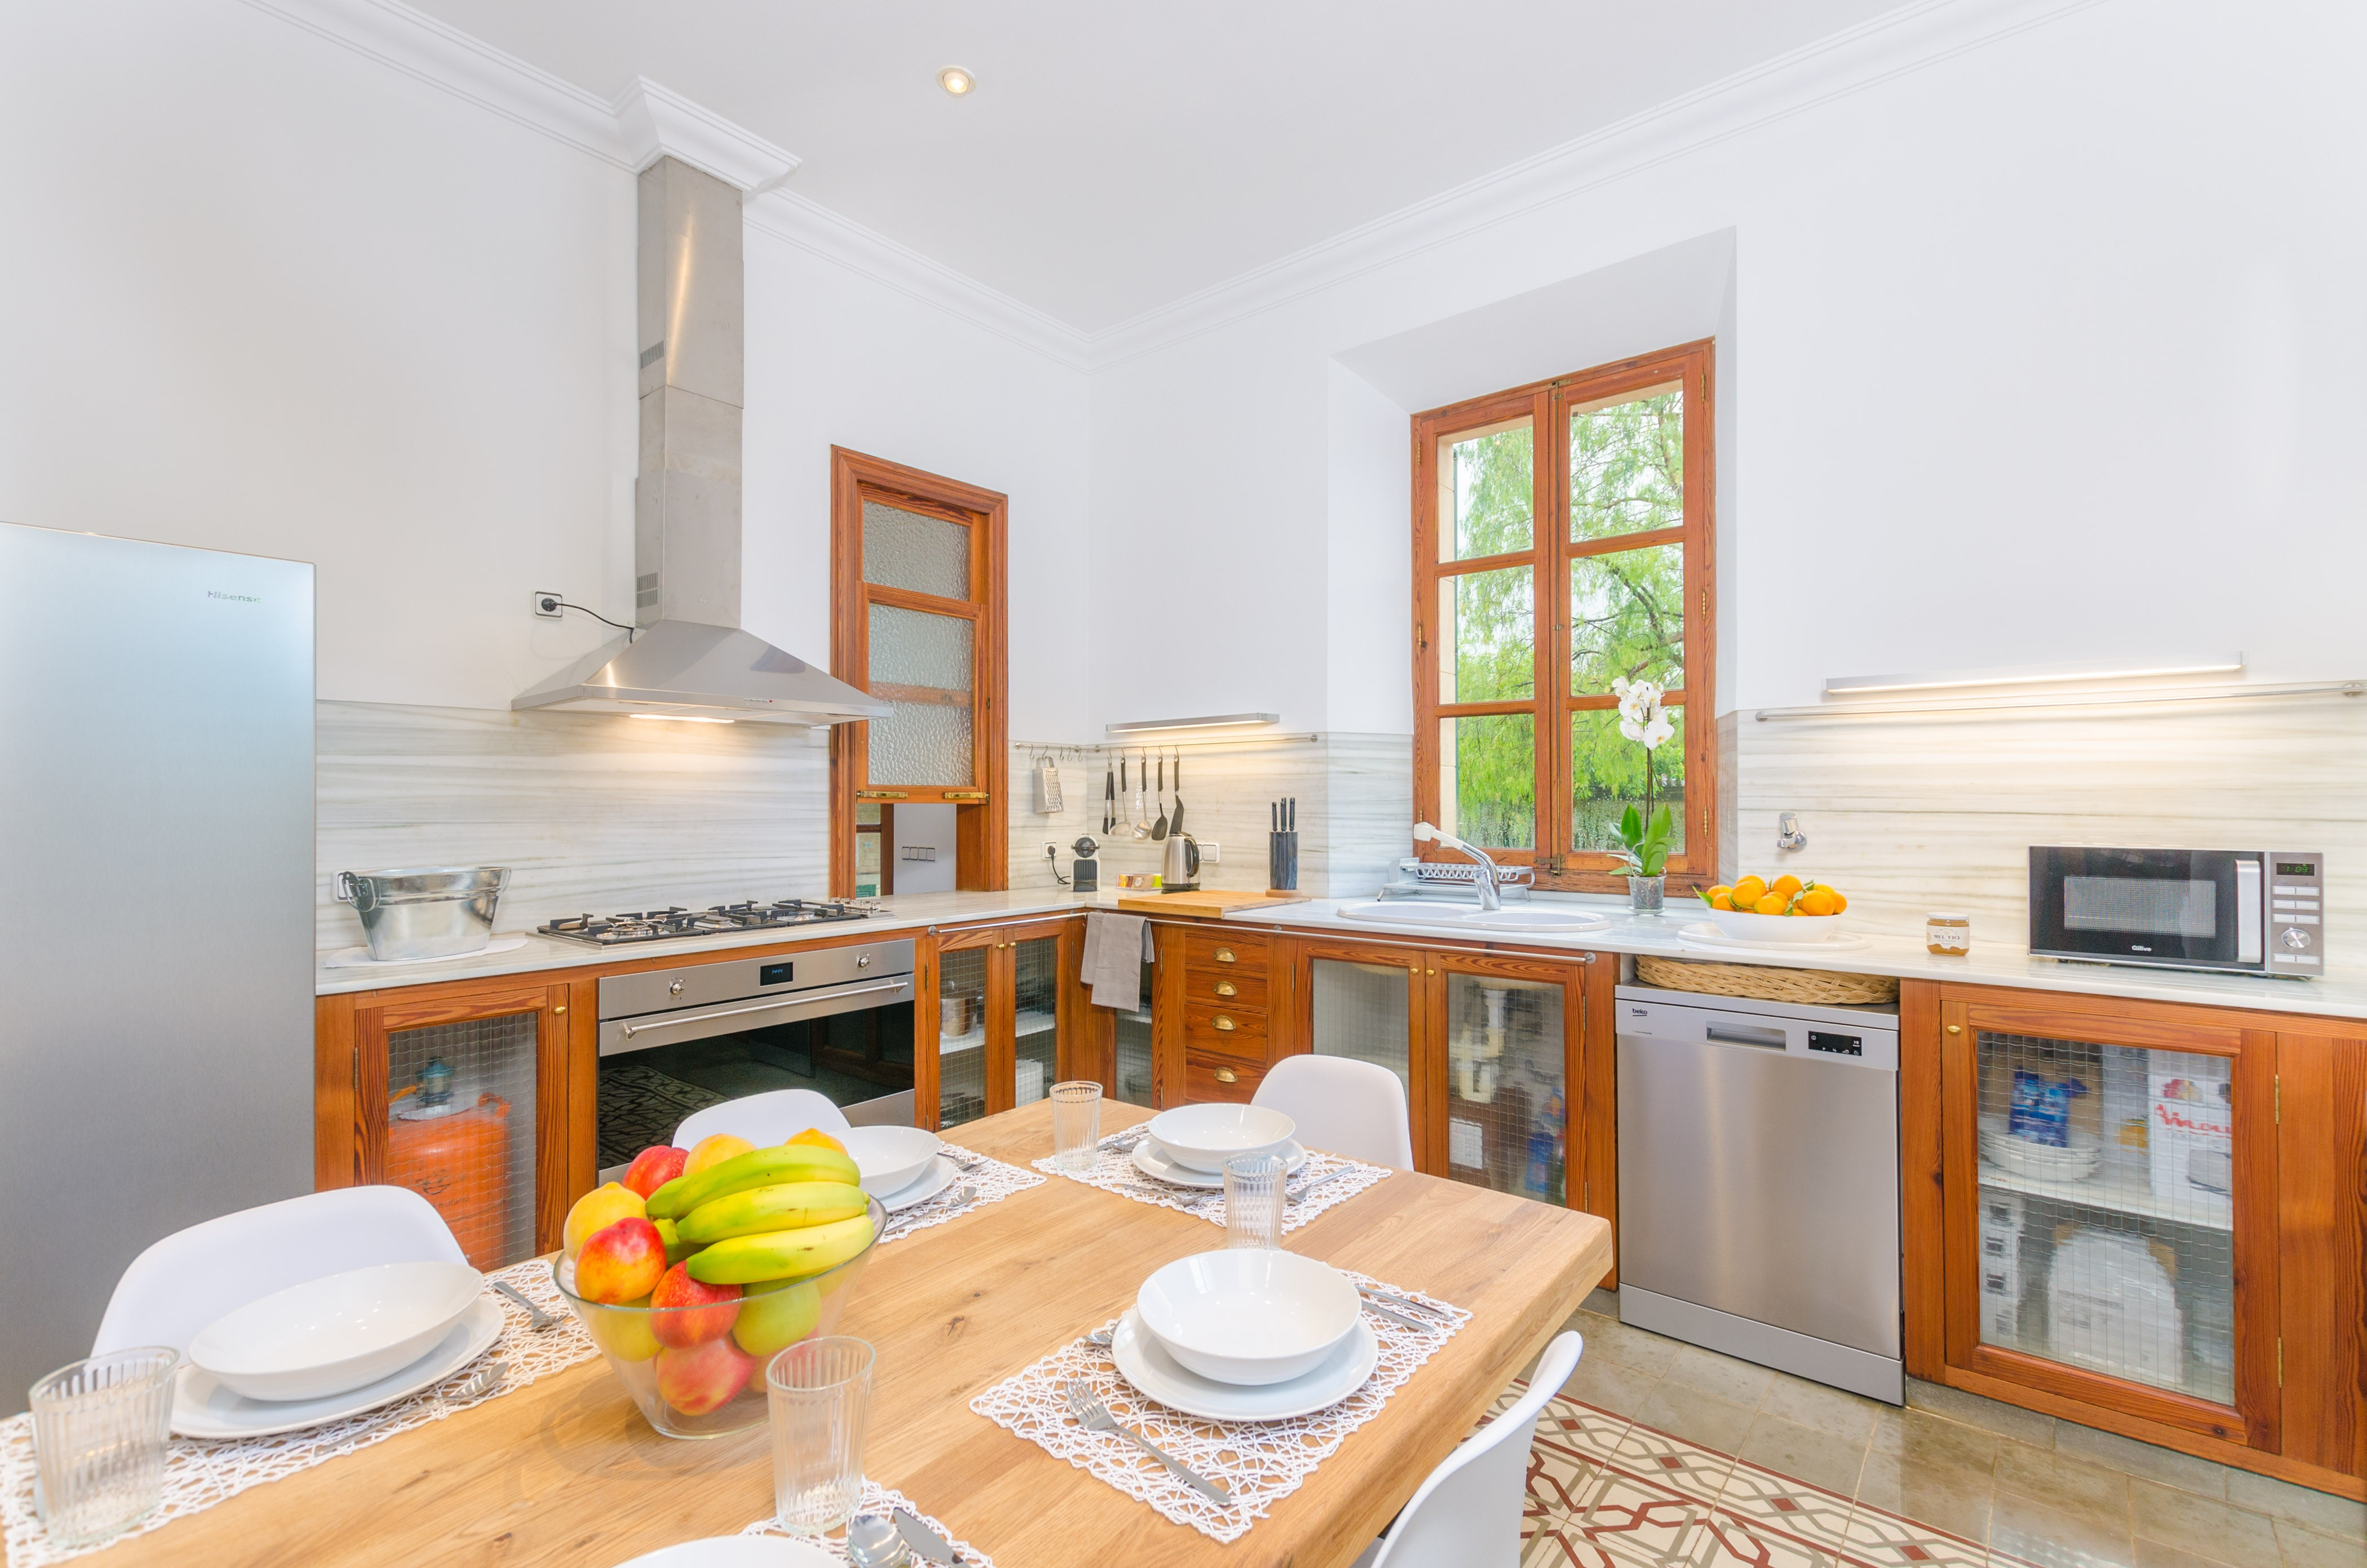 Maison de vacances CAS CONVIDATS (2435013), Alaro, Majorque, Iles Baléares, Espagne, image 29